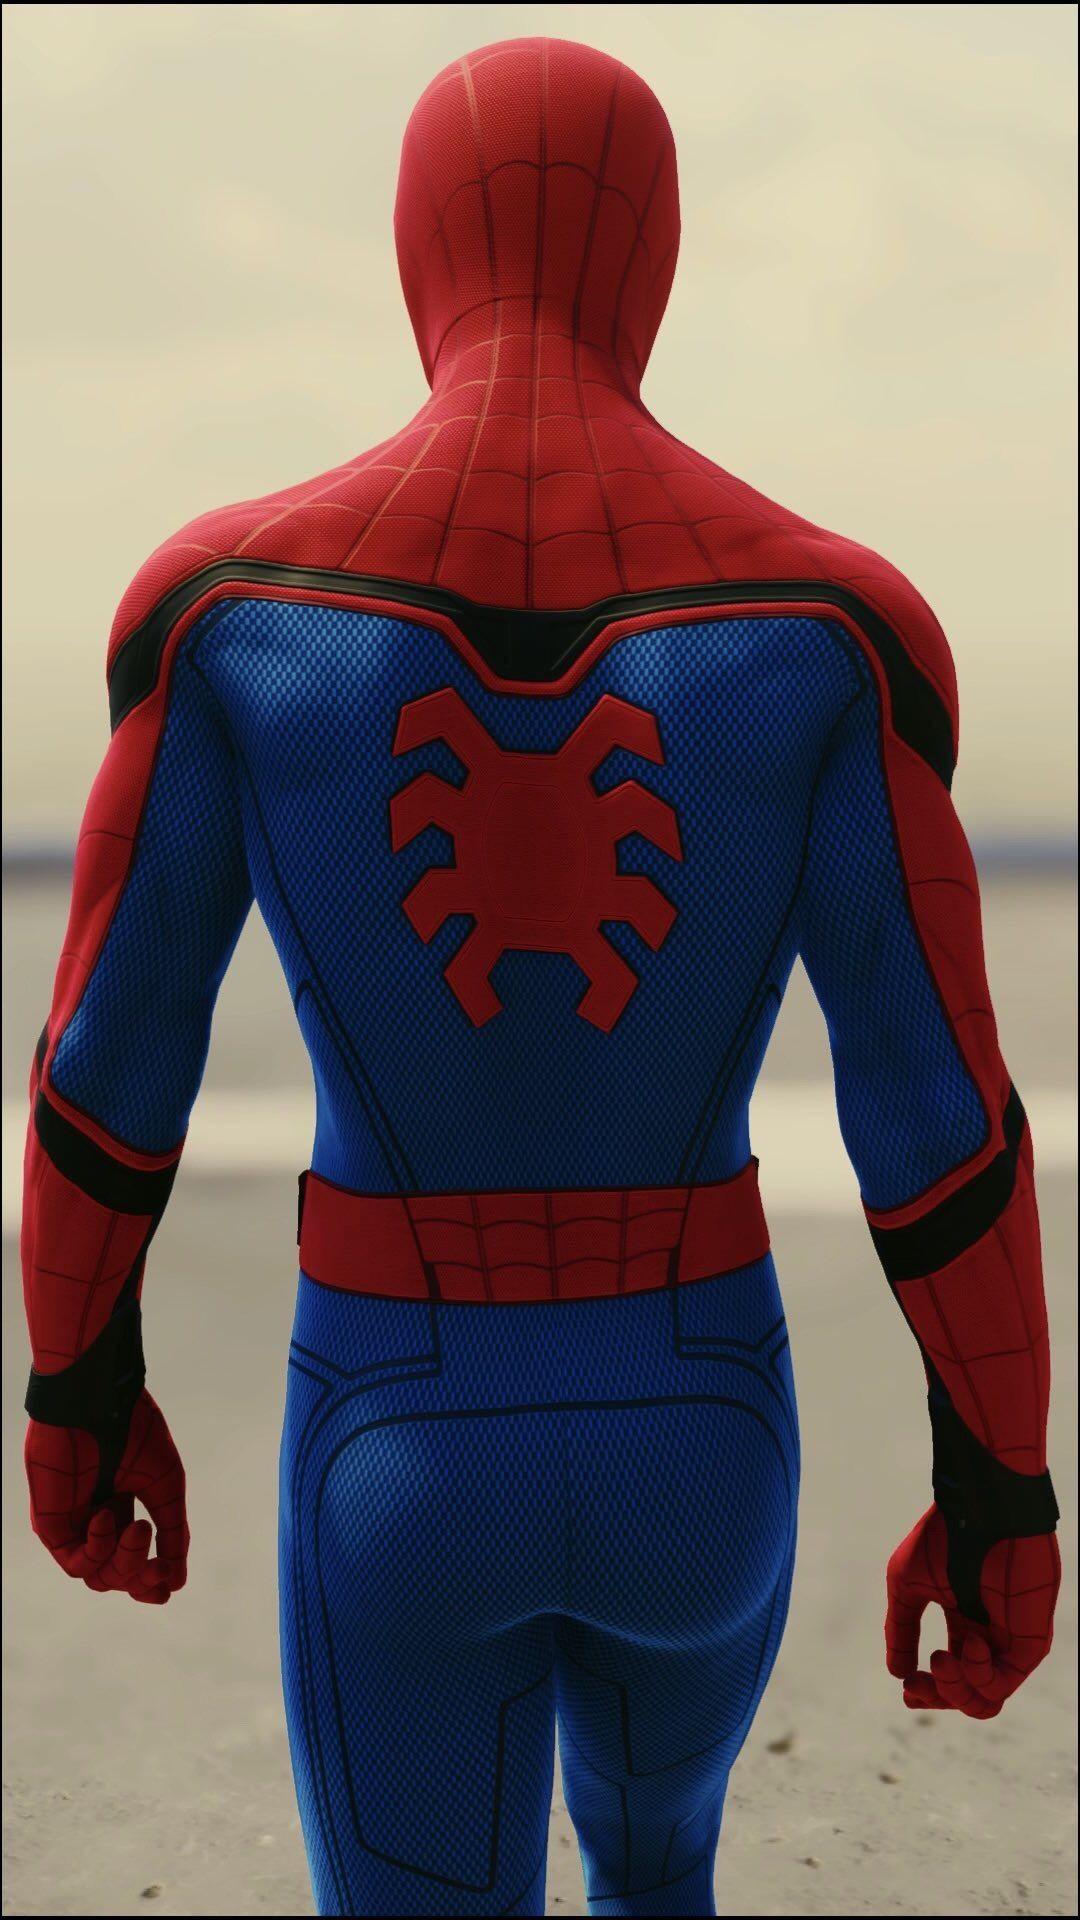 Pin By Arkhamnatic Arts On Marvel Comics Spiderman Marvel Marvel Comics